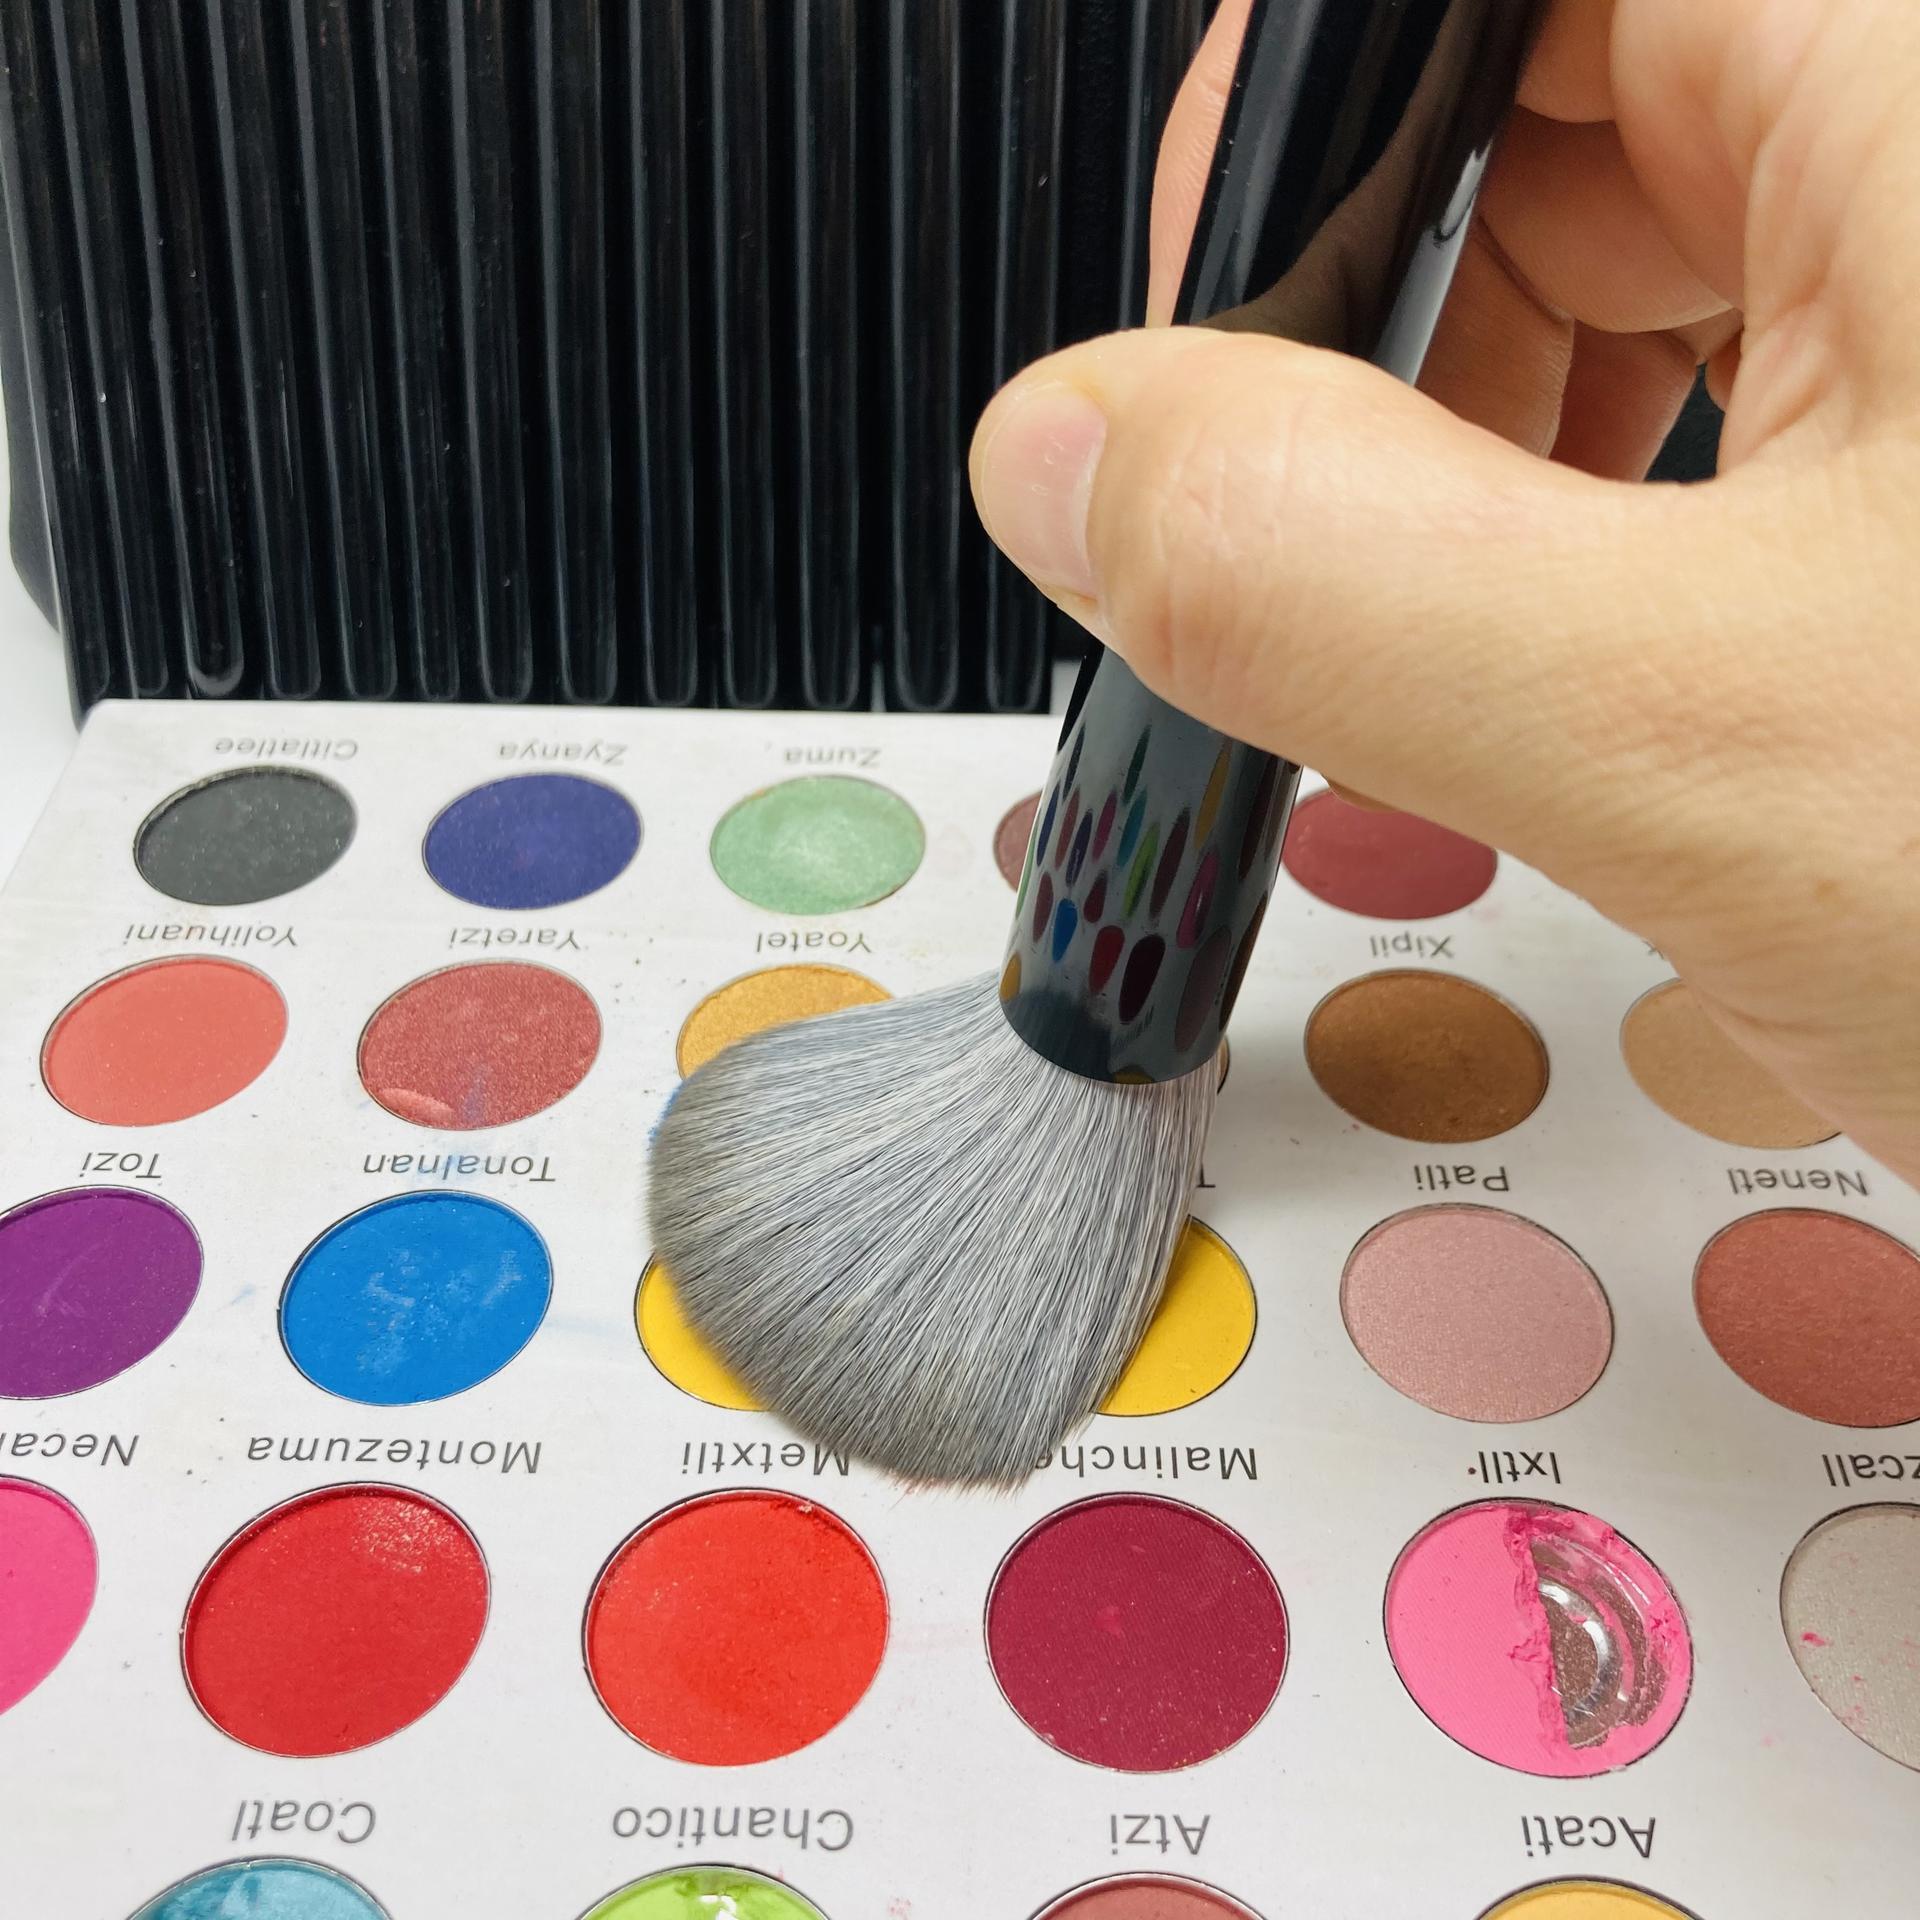 Free makeup samples cute pinceaux de maquillage make-up professional makeup brushes set